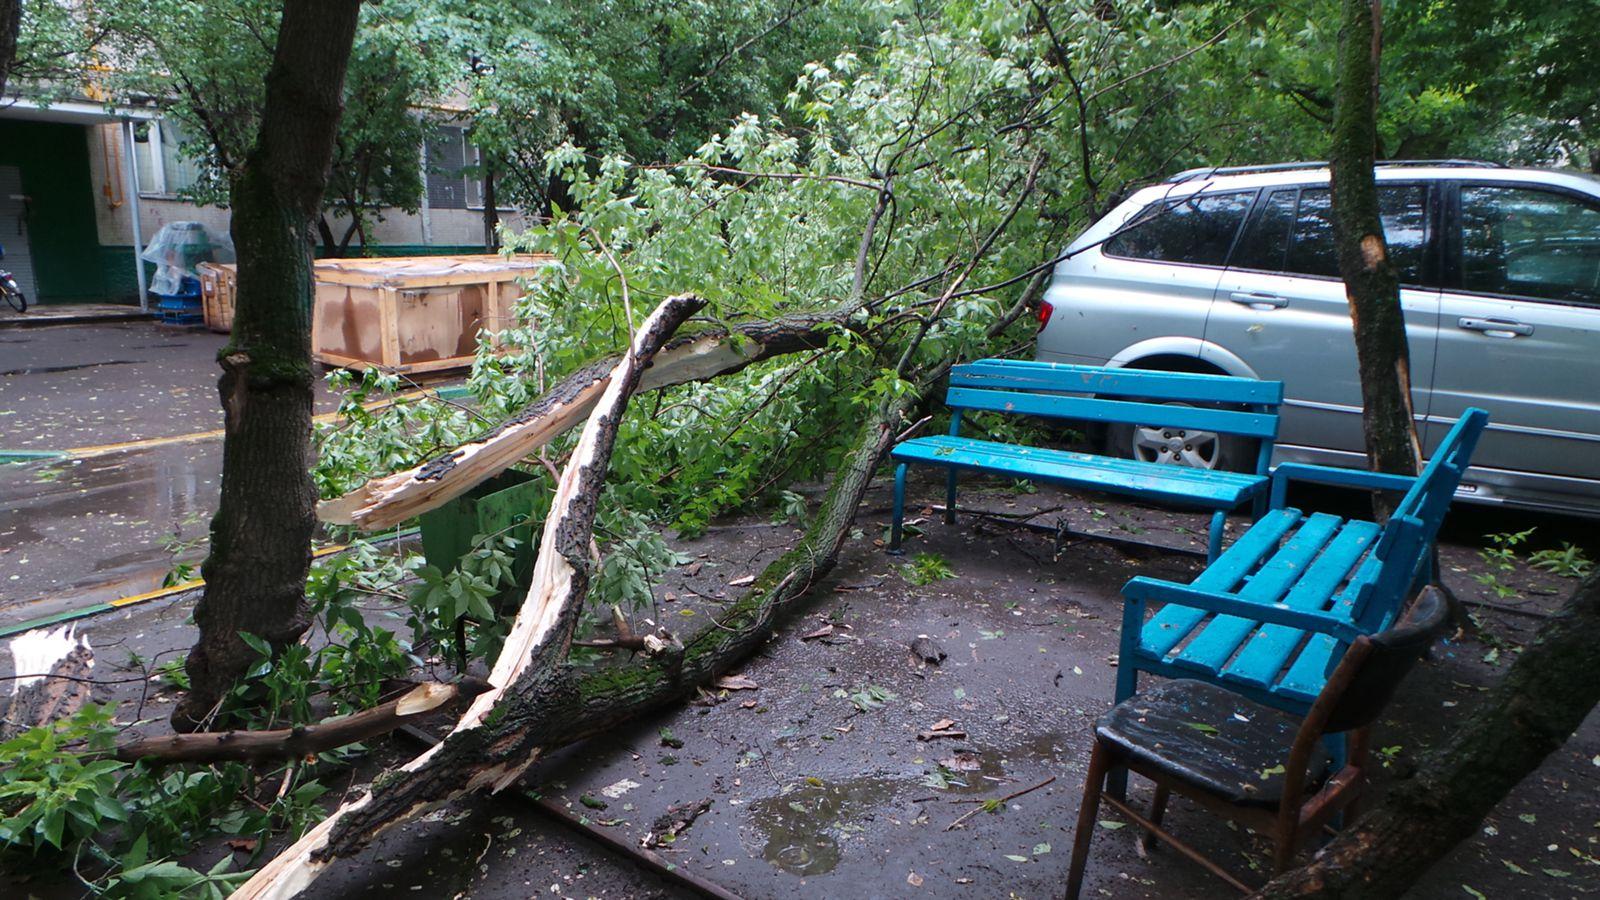 Дерево упало на машину, кто виноват?